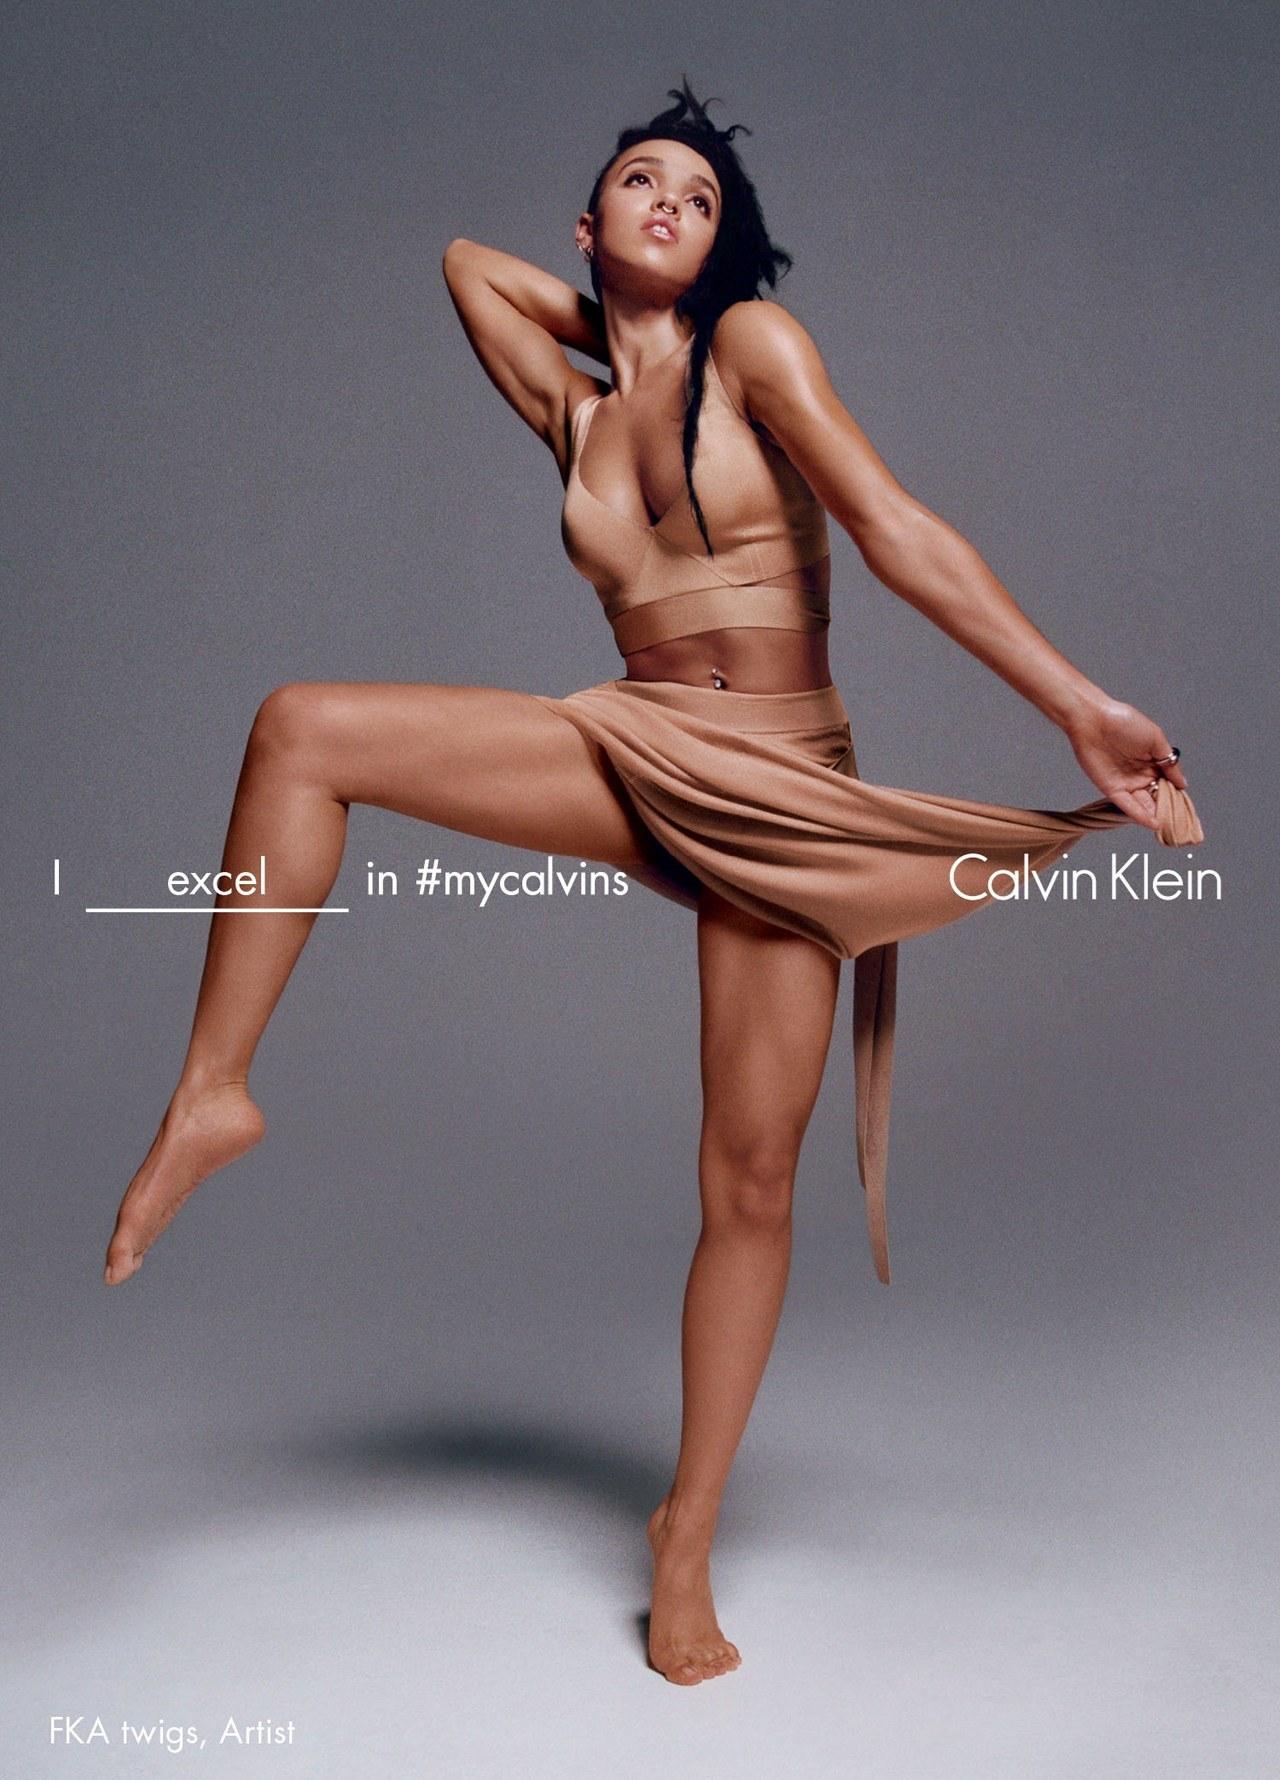 calvin-klein-spring-2016-campaign-fka-twigs-Vogue-27Jan16-tyrone-lebon_b